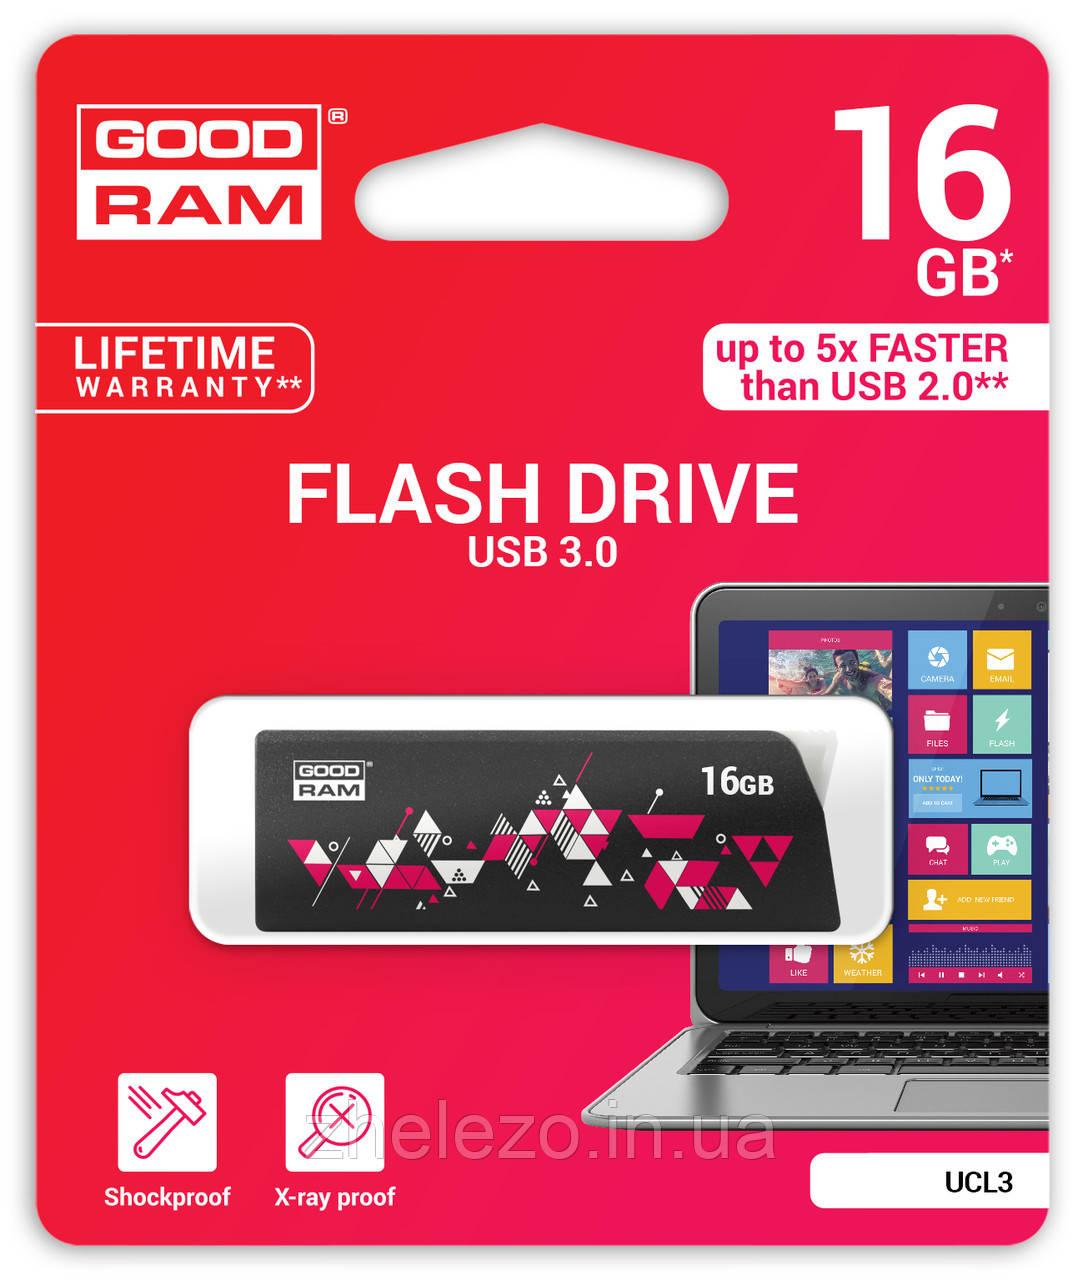 Флеш-накопичувач USB3.0 16GB GOODRAM UCL3 (Cl!ck) Black (UCL3-0160K0R11)